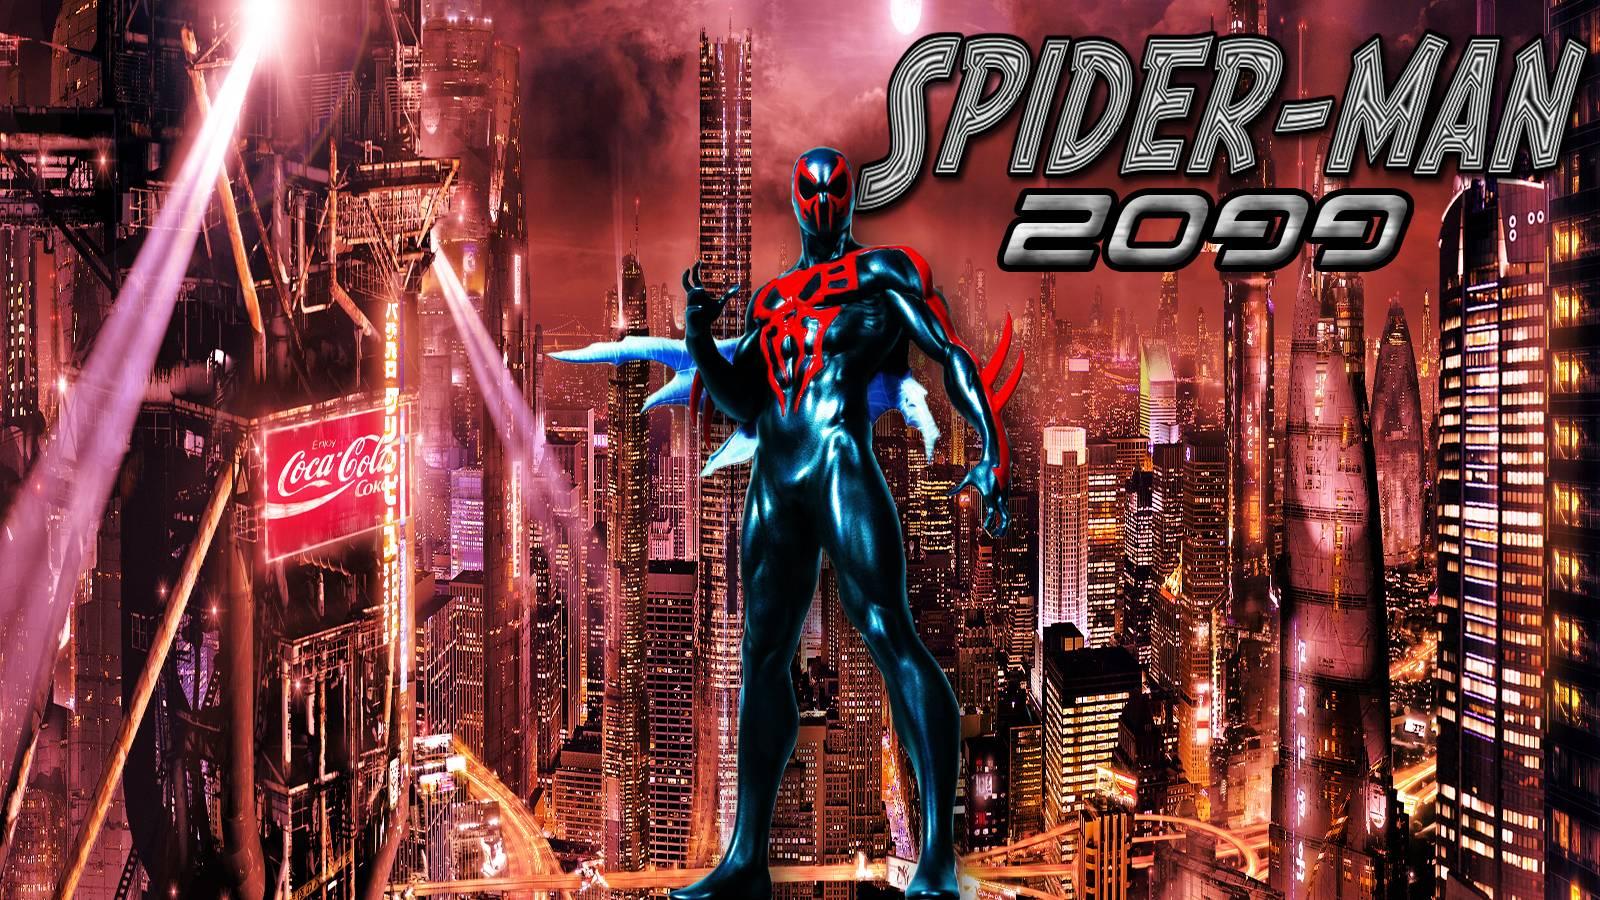 Spiderman Hd Wallpaper Spider Man 2099 Wallpapers Wallpaper Cave